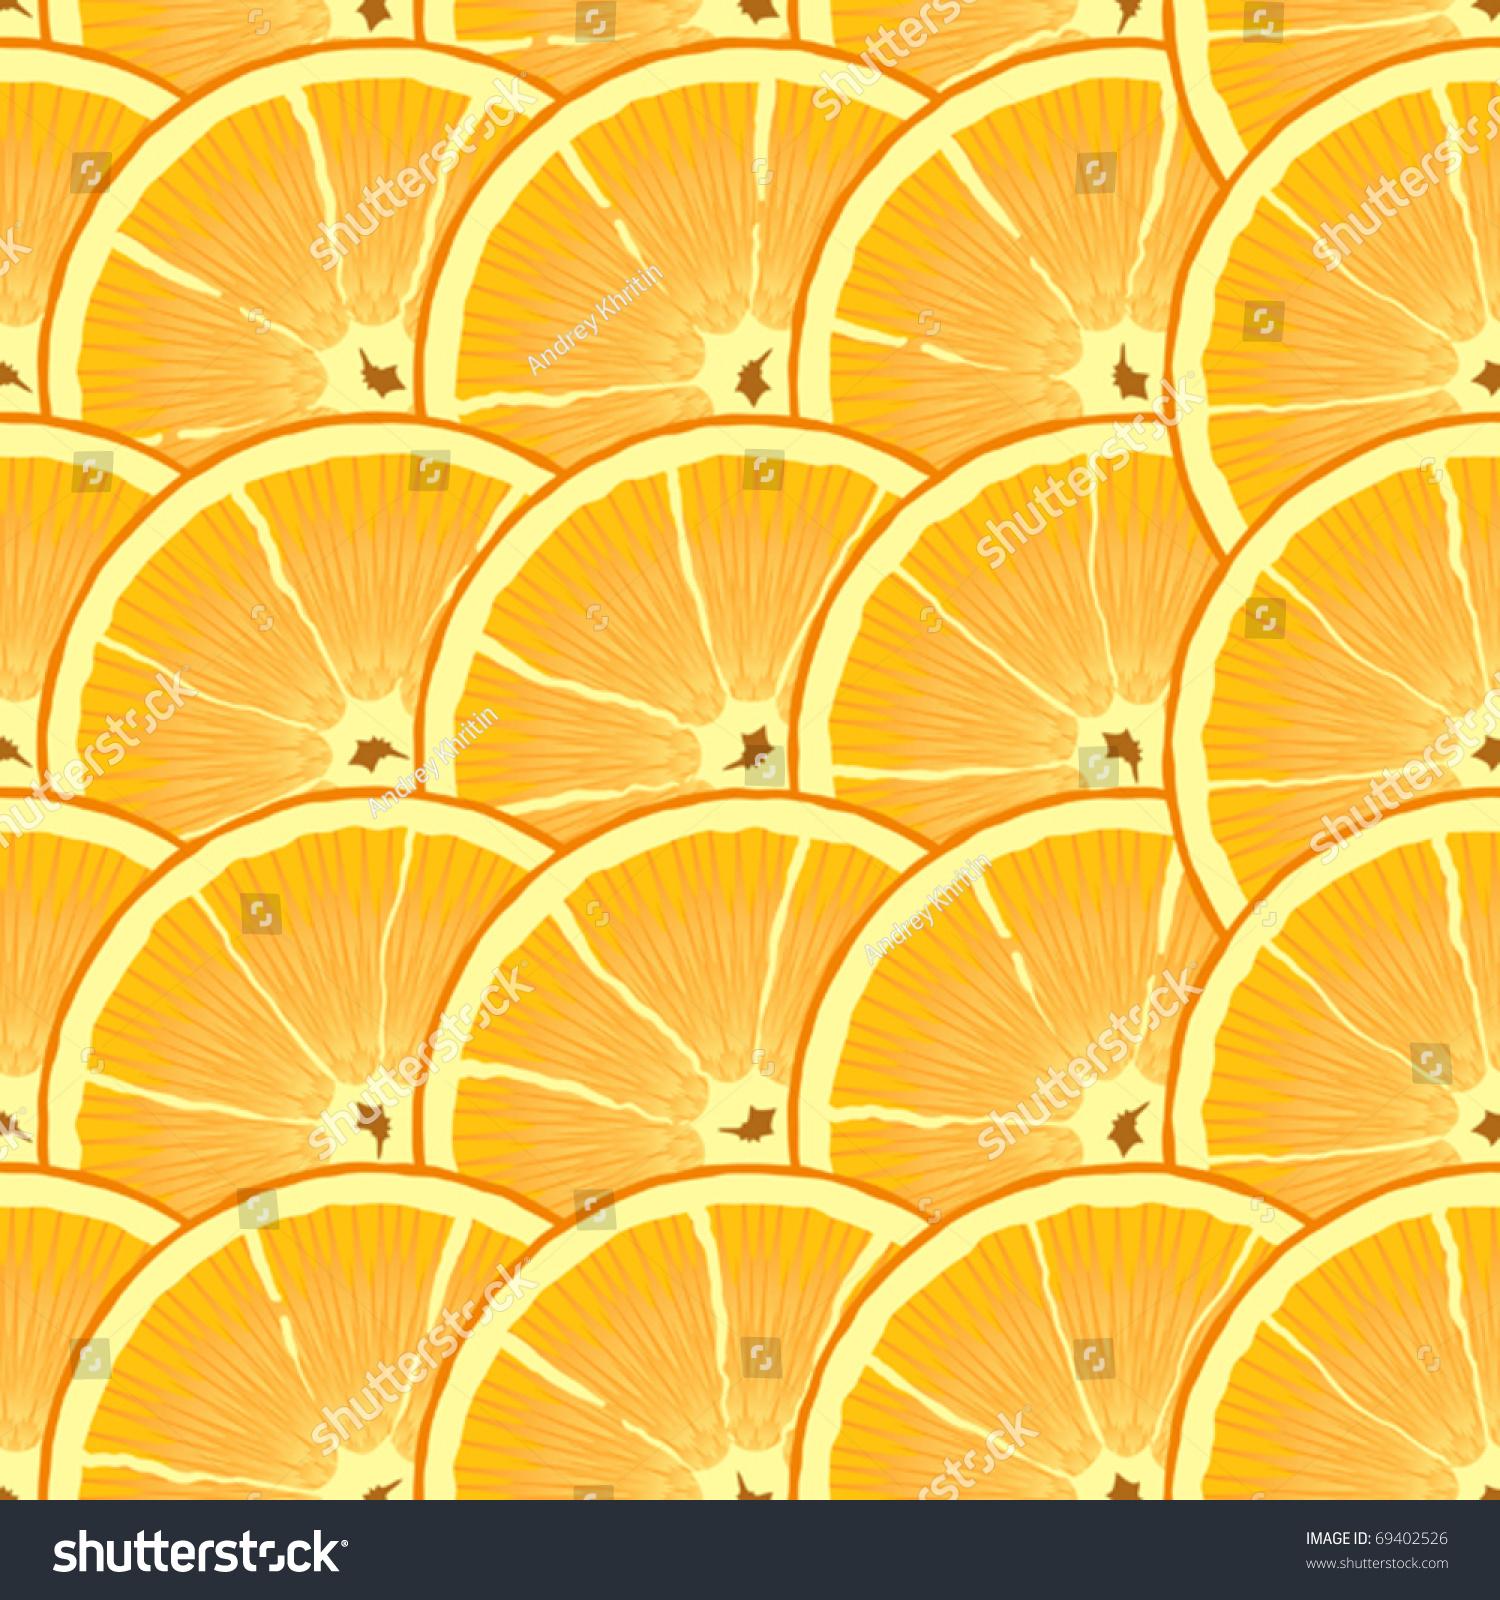 ppt背景图素材橙色元素